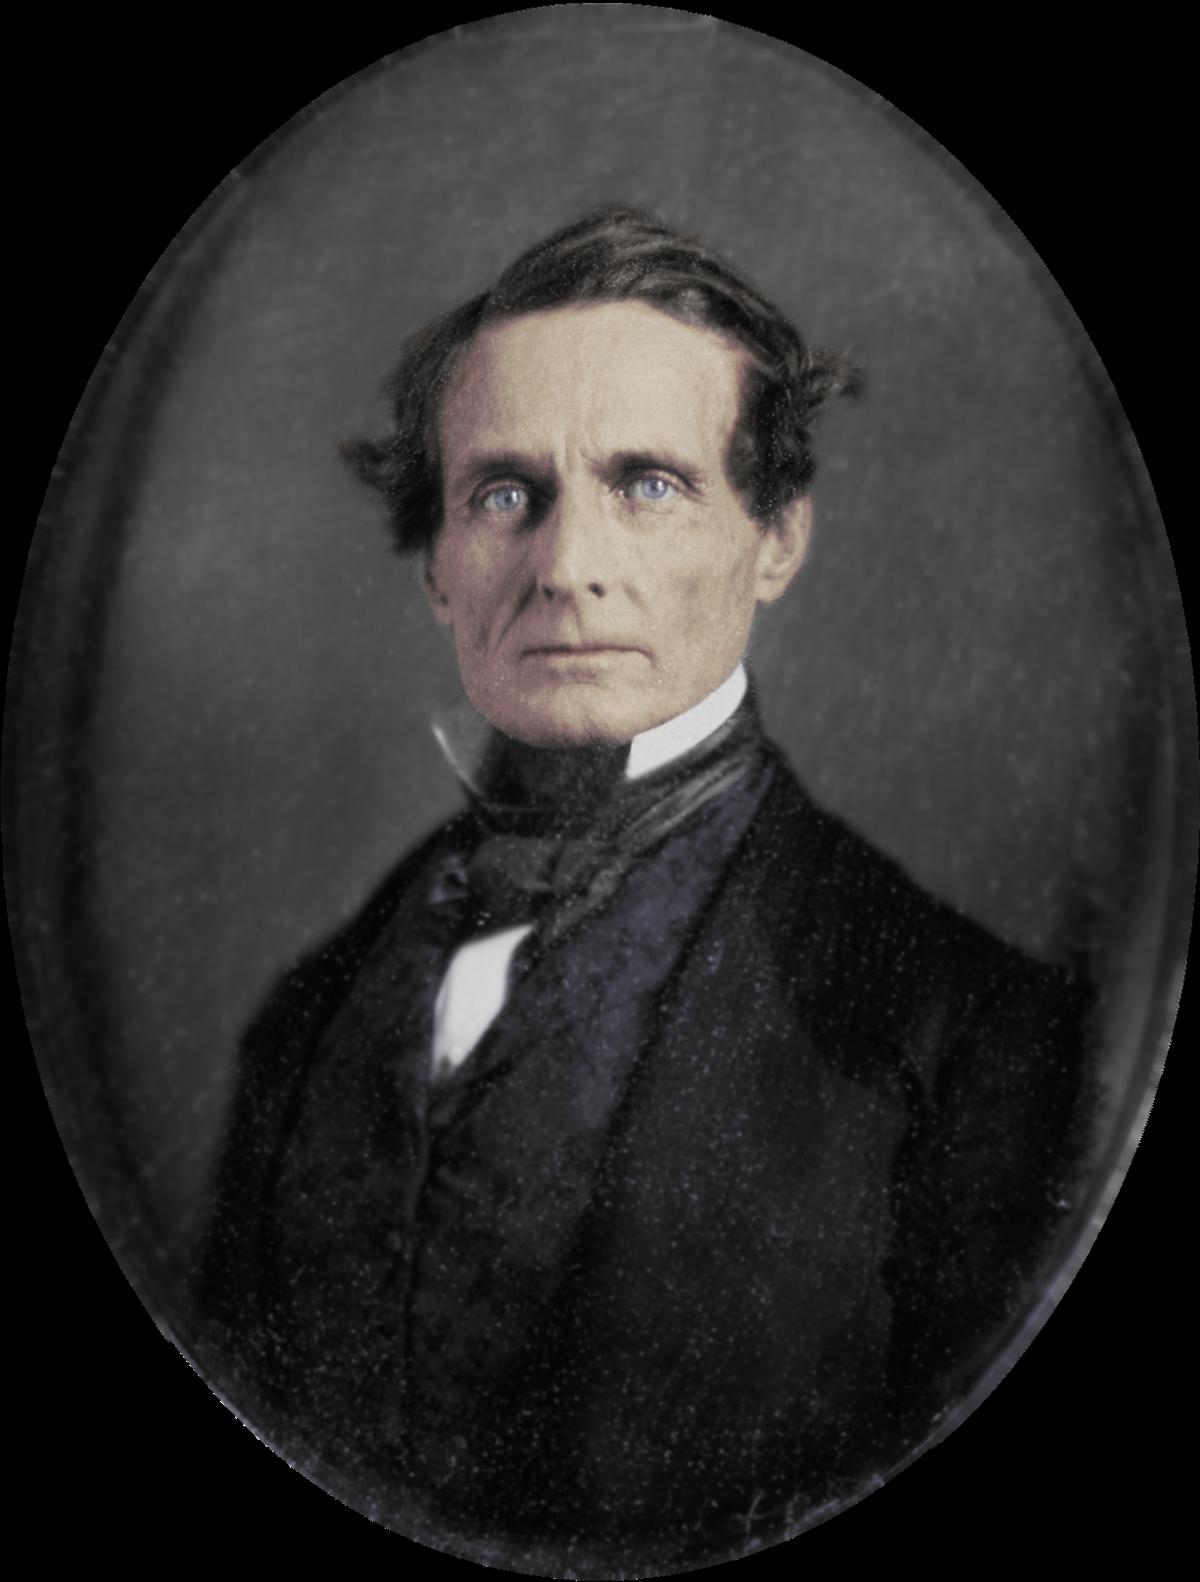 Biography of Jefferson Davis, President of the Confederacy